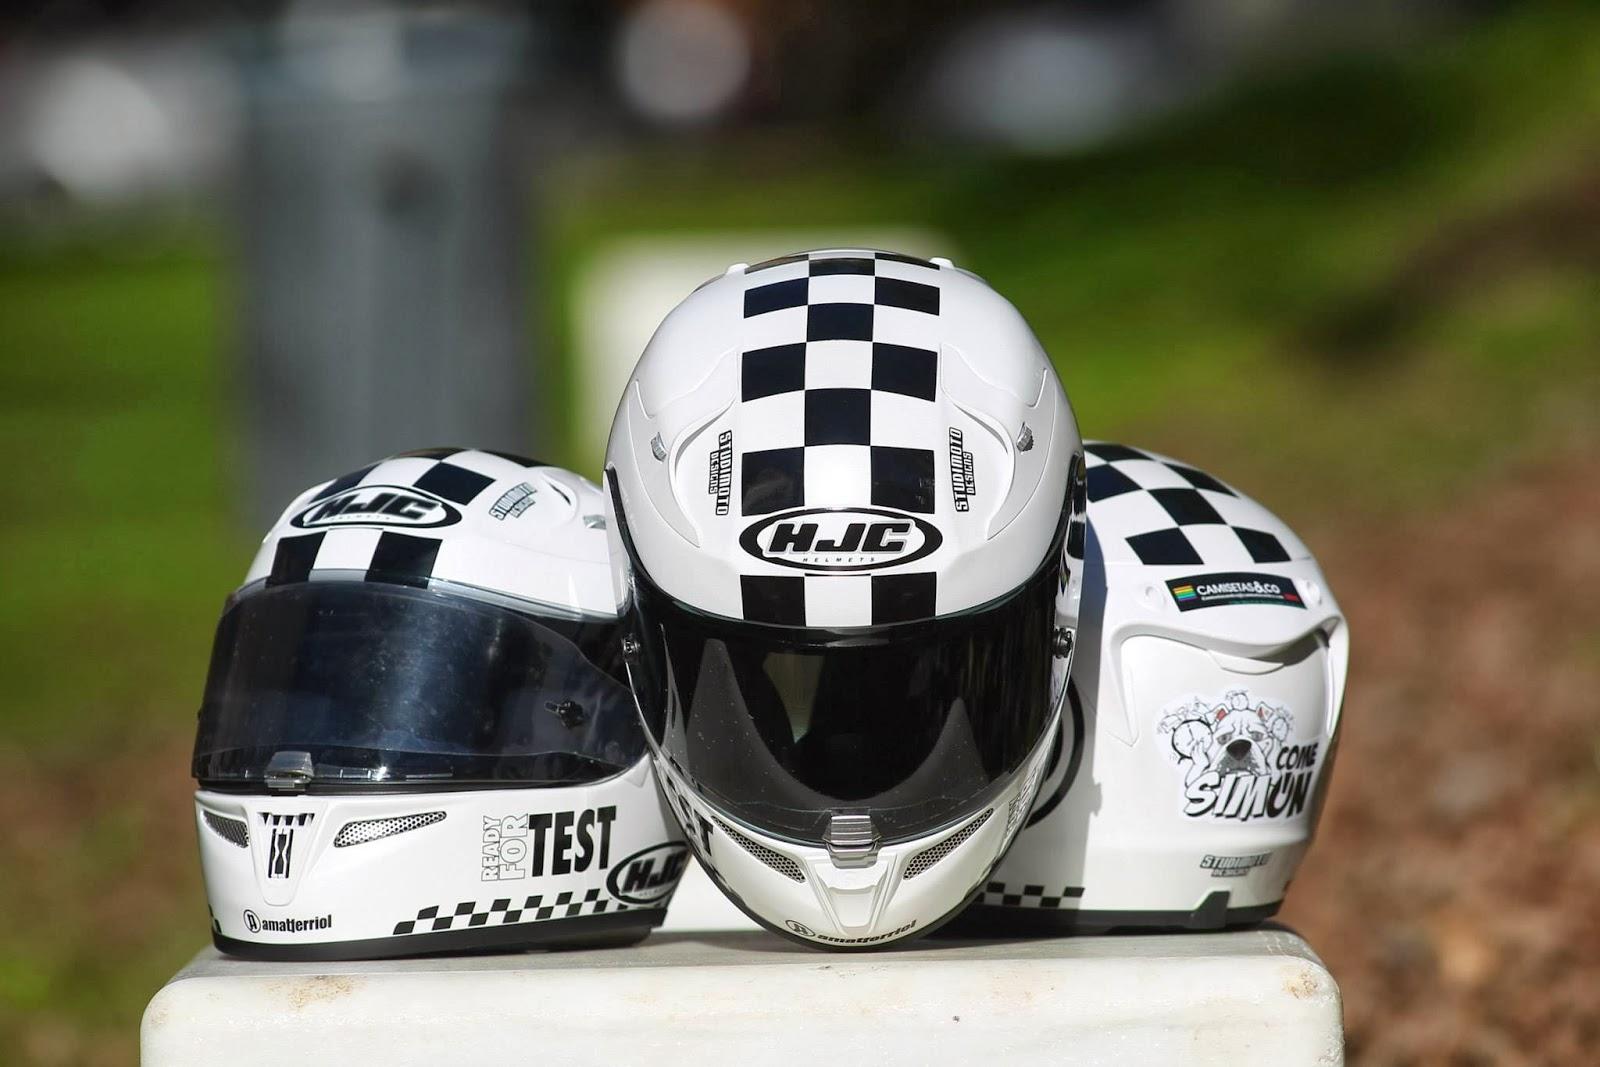 racing helmets garage hjc r pha10 plus j sim n winter. Black Bedroom Furniture Sets. Home Design Ideas